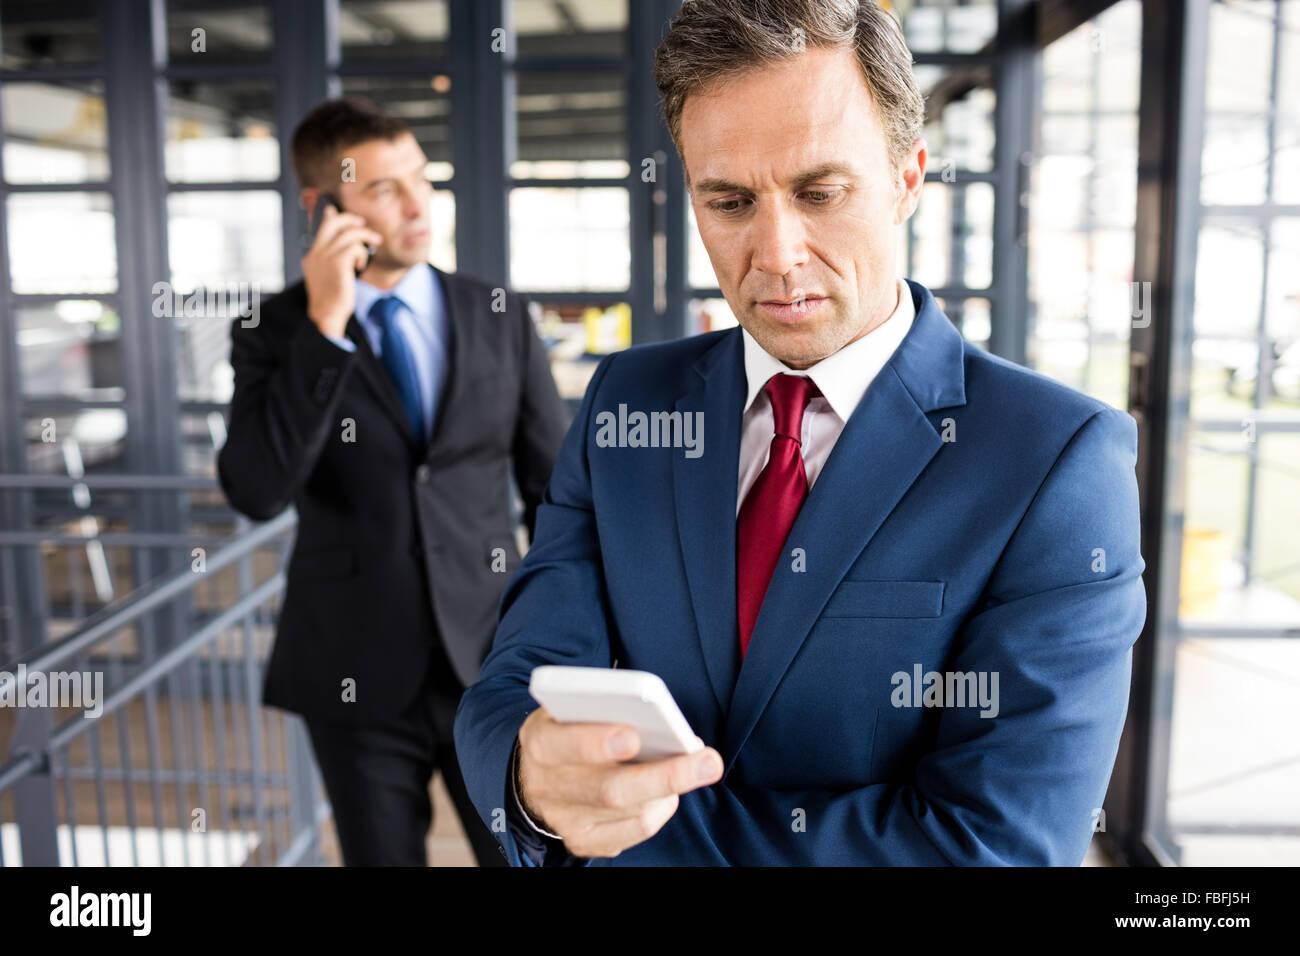 Business people having phone calls - Stock Image